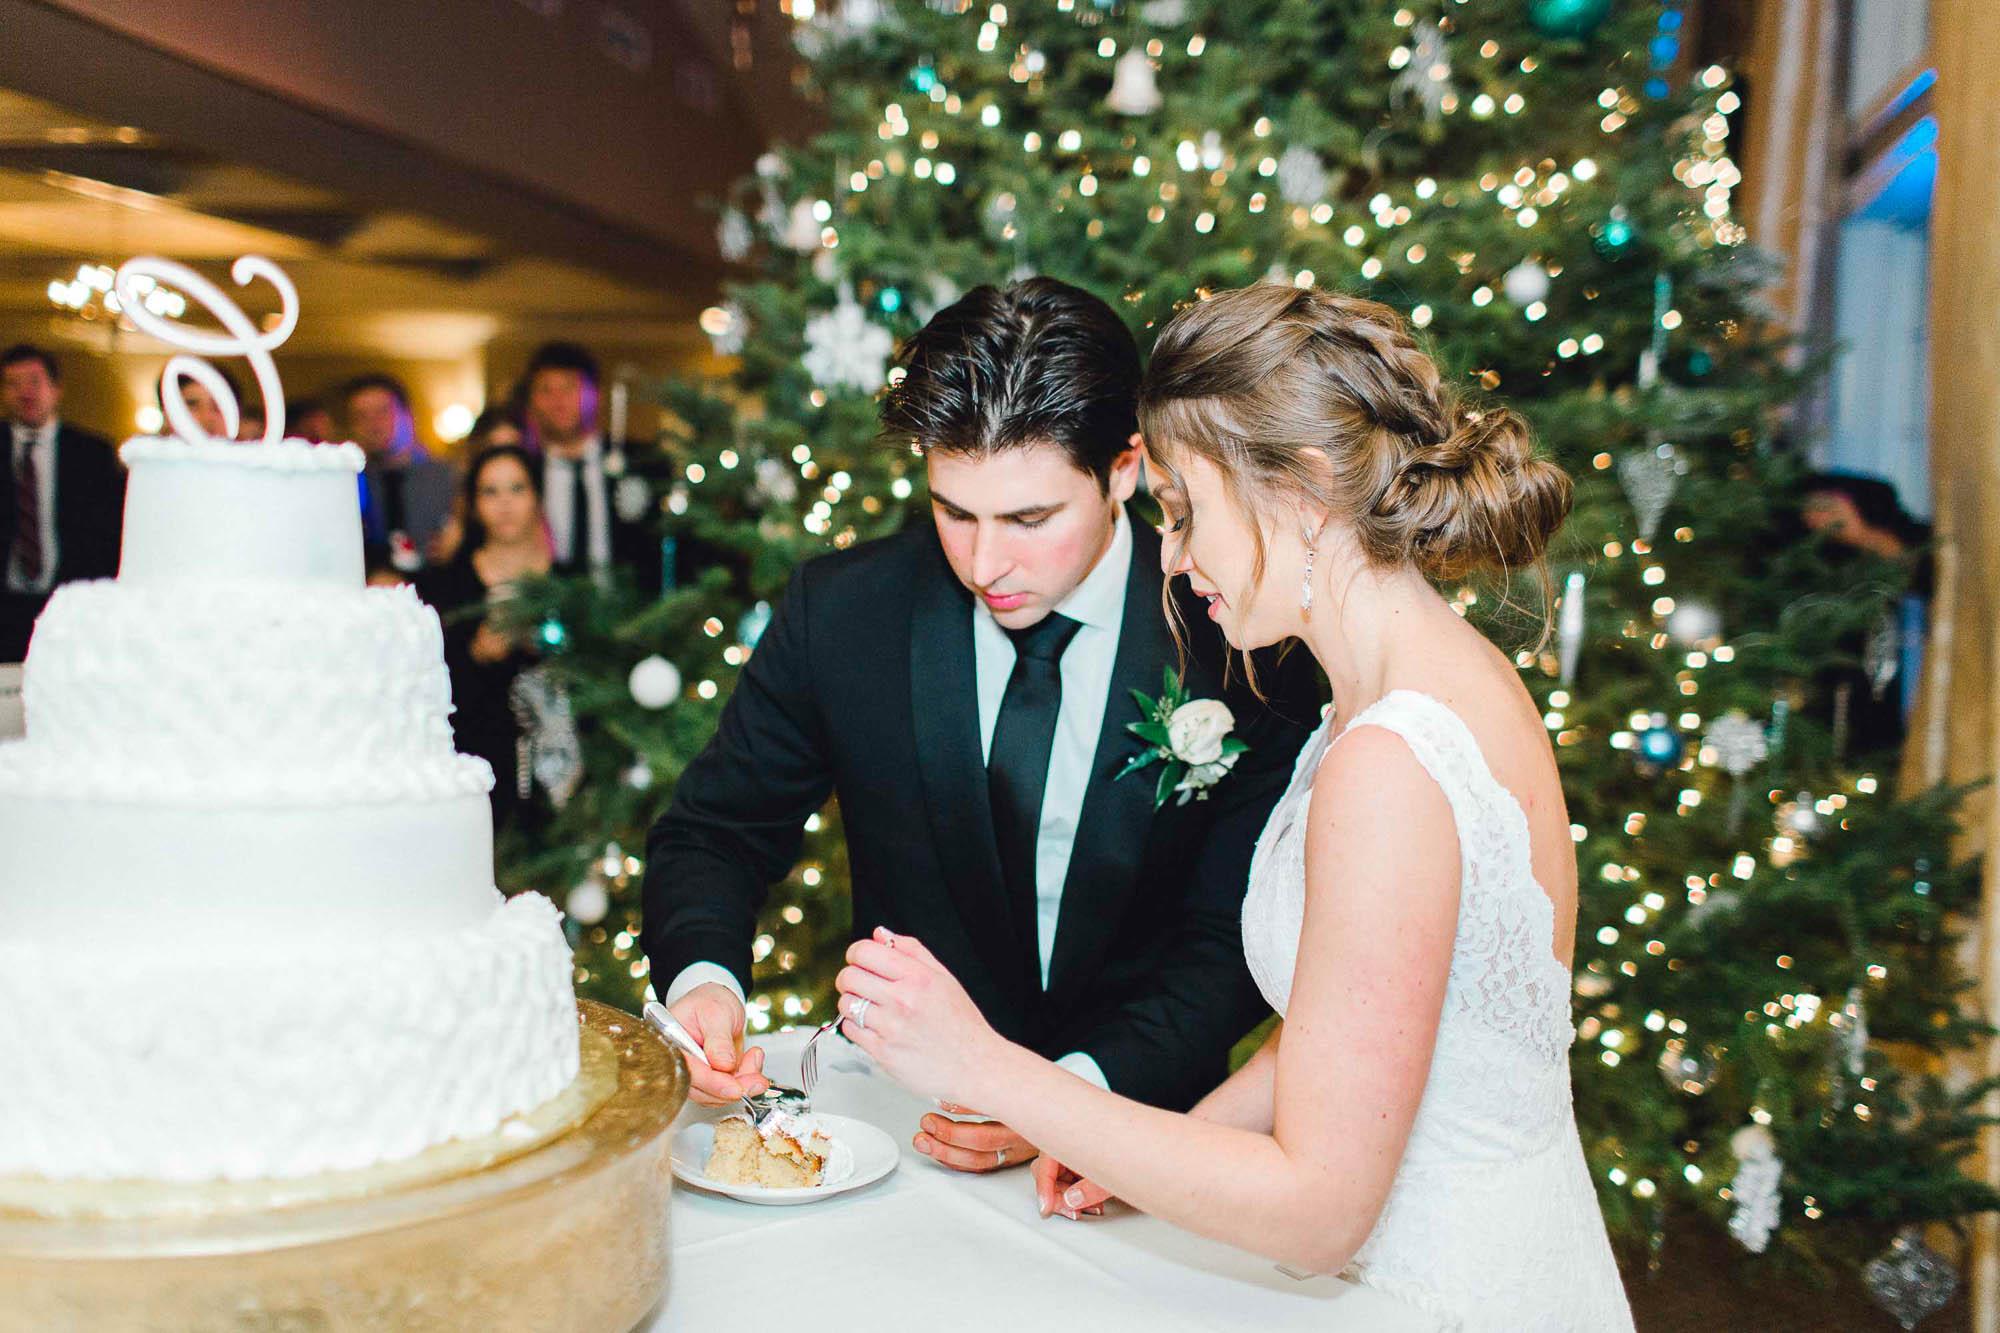 snowy-sand-springs-country-club-drums-pa-christmas-wedding-35145.jpg